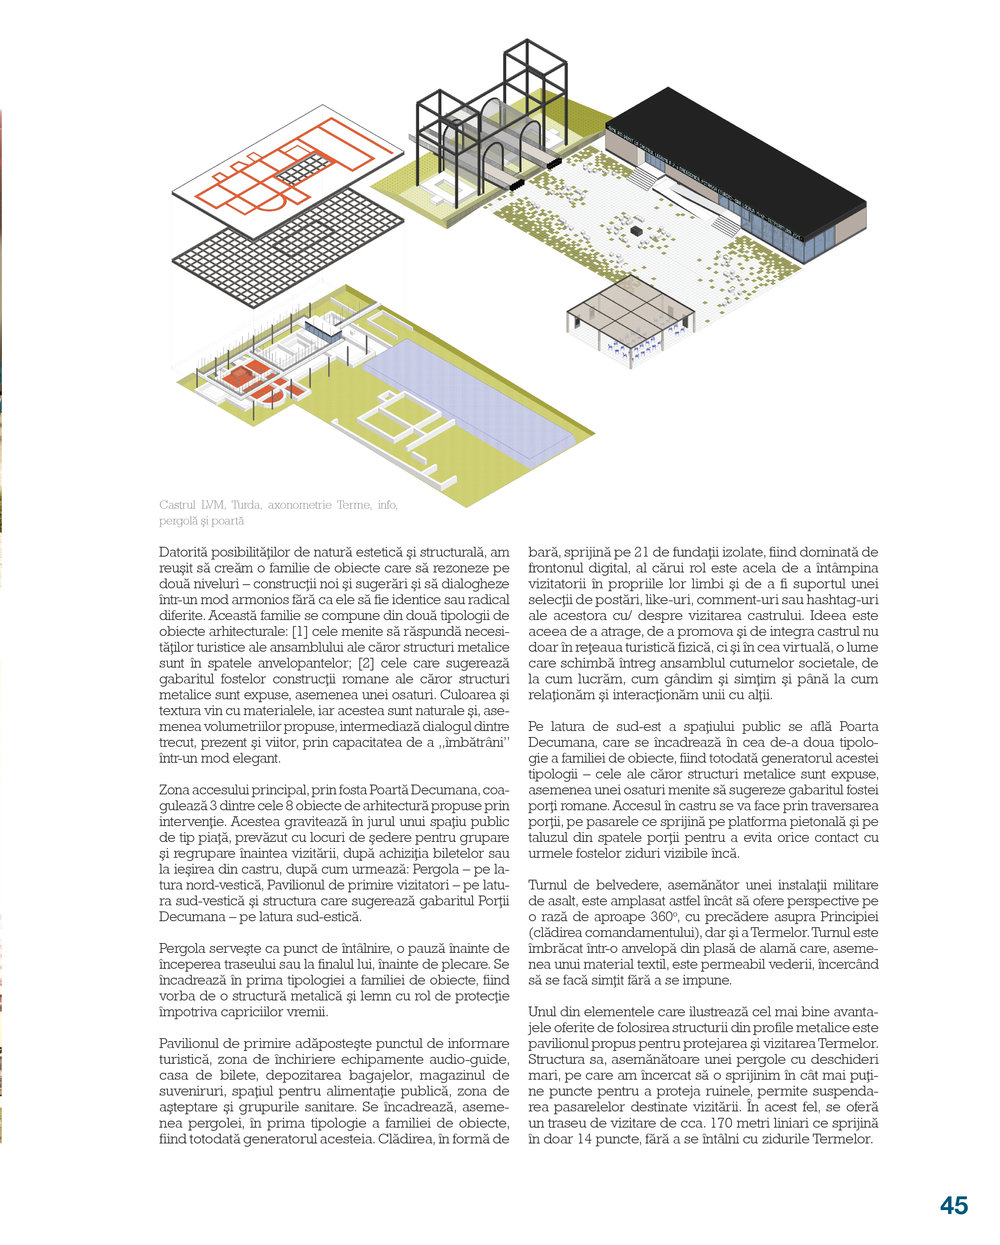 6_Arhitecturi in crestere 6.jpg